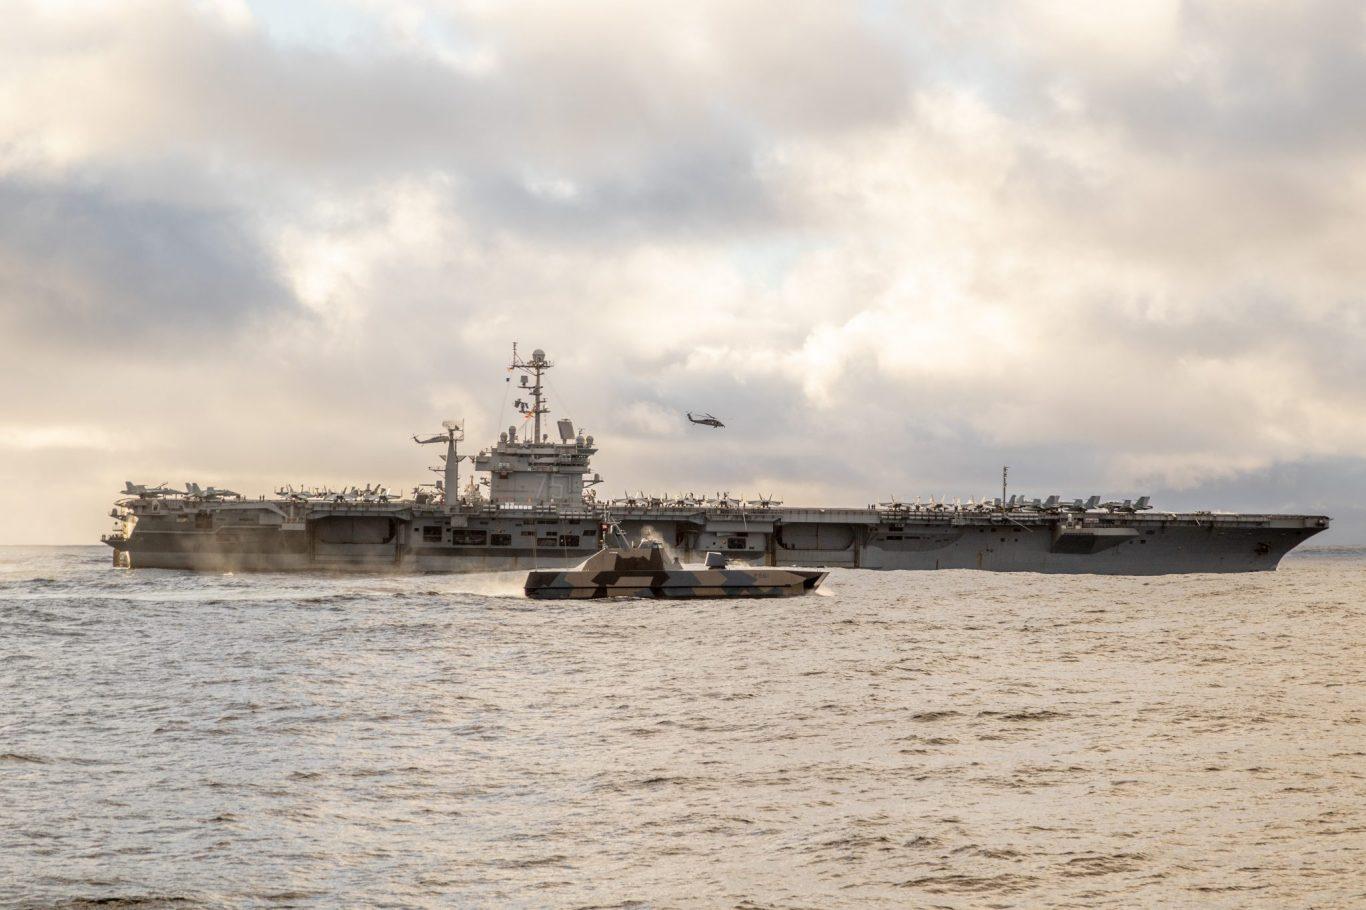 USS Harry S. Truman og  KNM Storm under Trident Juncture 2018. Foto: Sverre Aa. Andreassen / Forsvaret